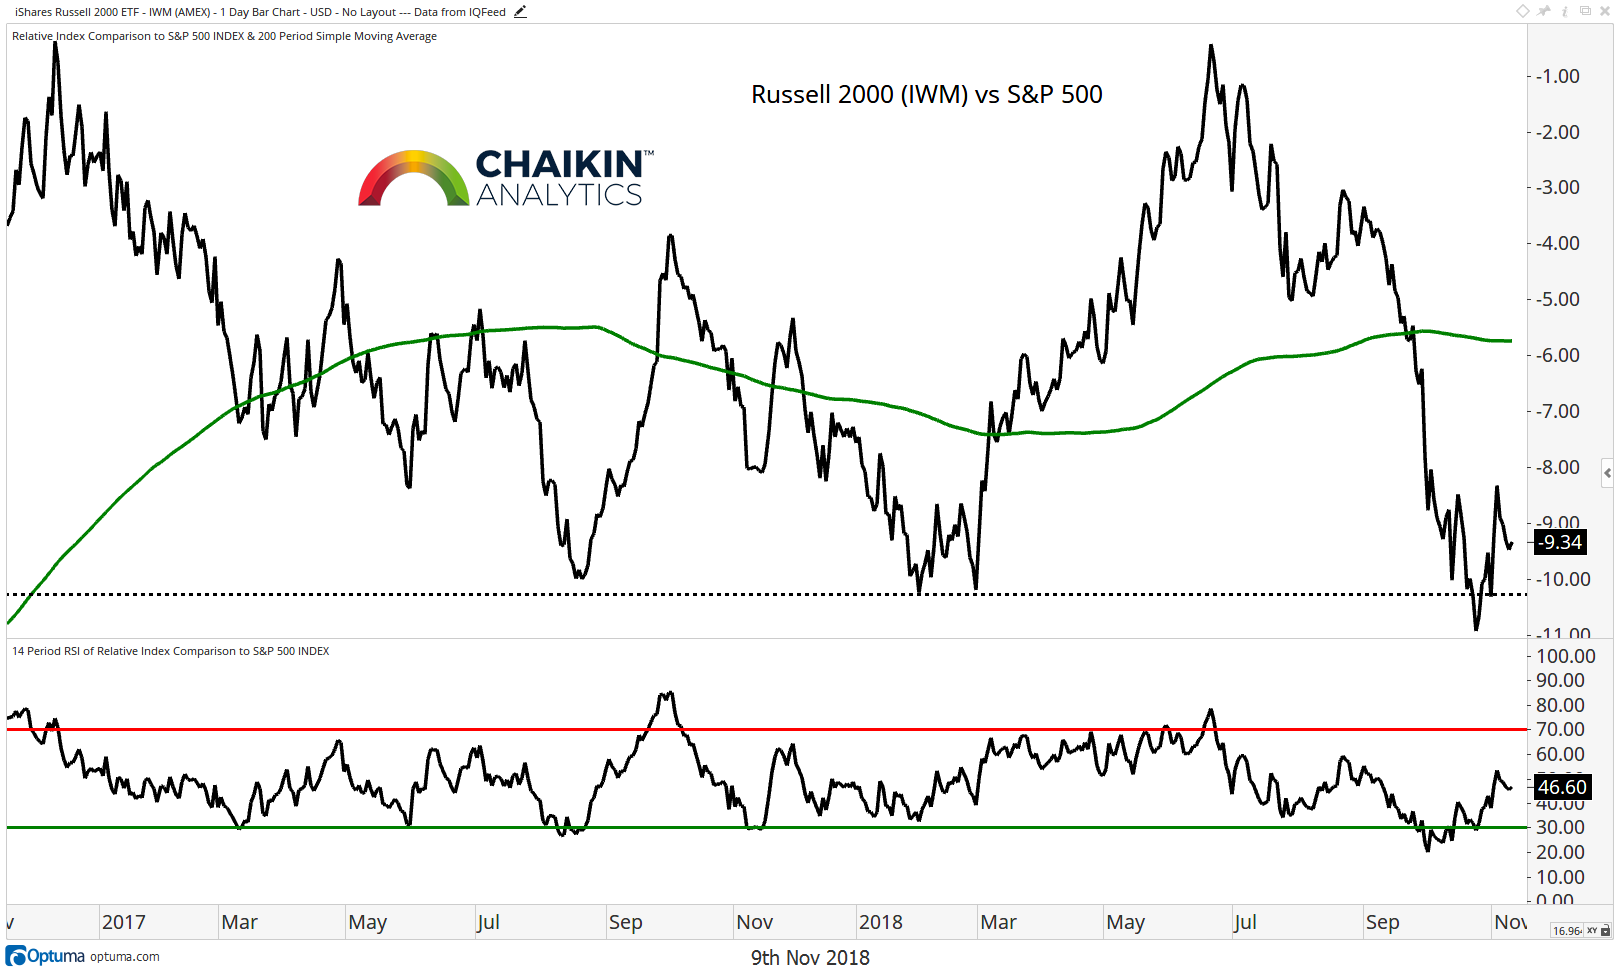 russell 2000 small cap stocks performance year 2018 investing bearish november